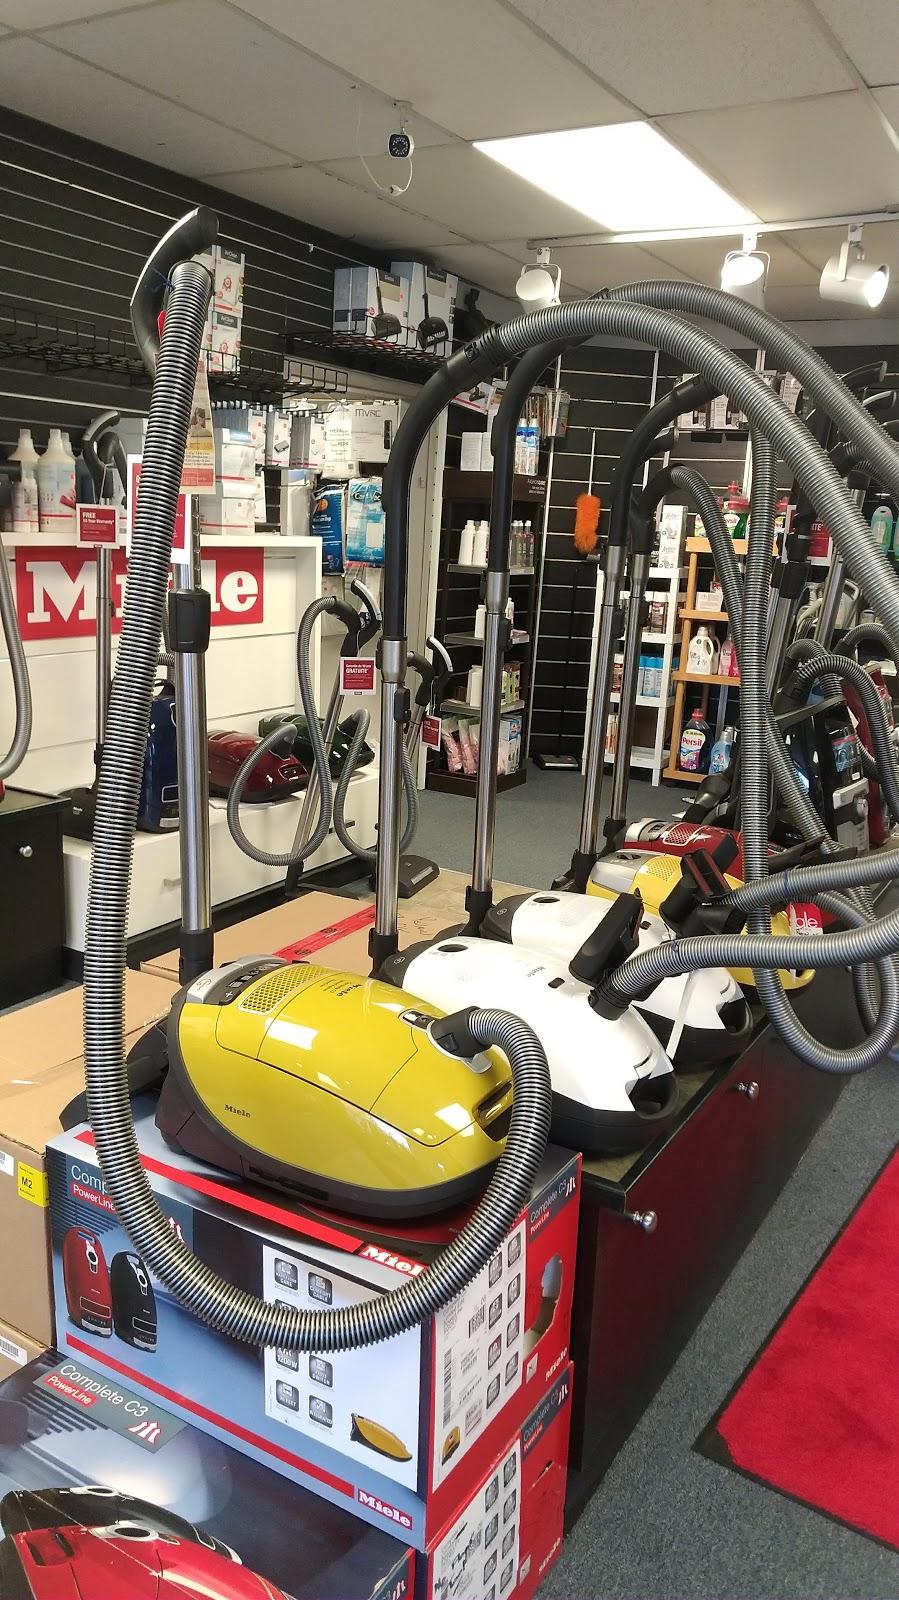 All Victoria Vacuums | store | 1400 Hillside Ave, Victoria, BC V8T 2B7, Canada | 2505952622 OR +1 250-595-2622